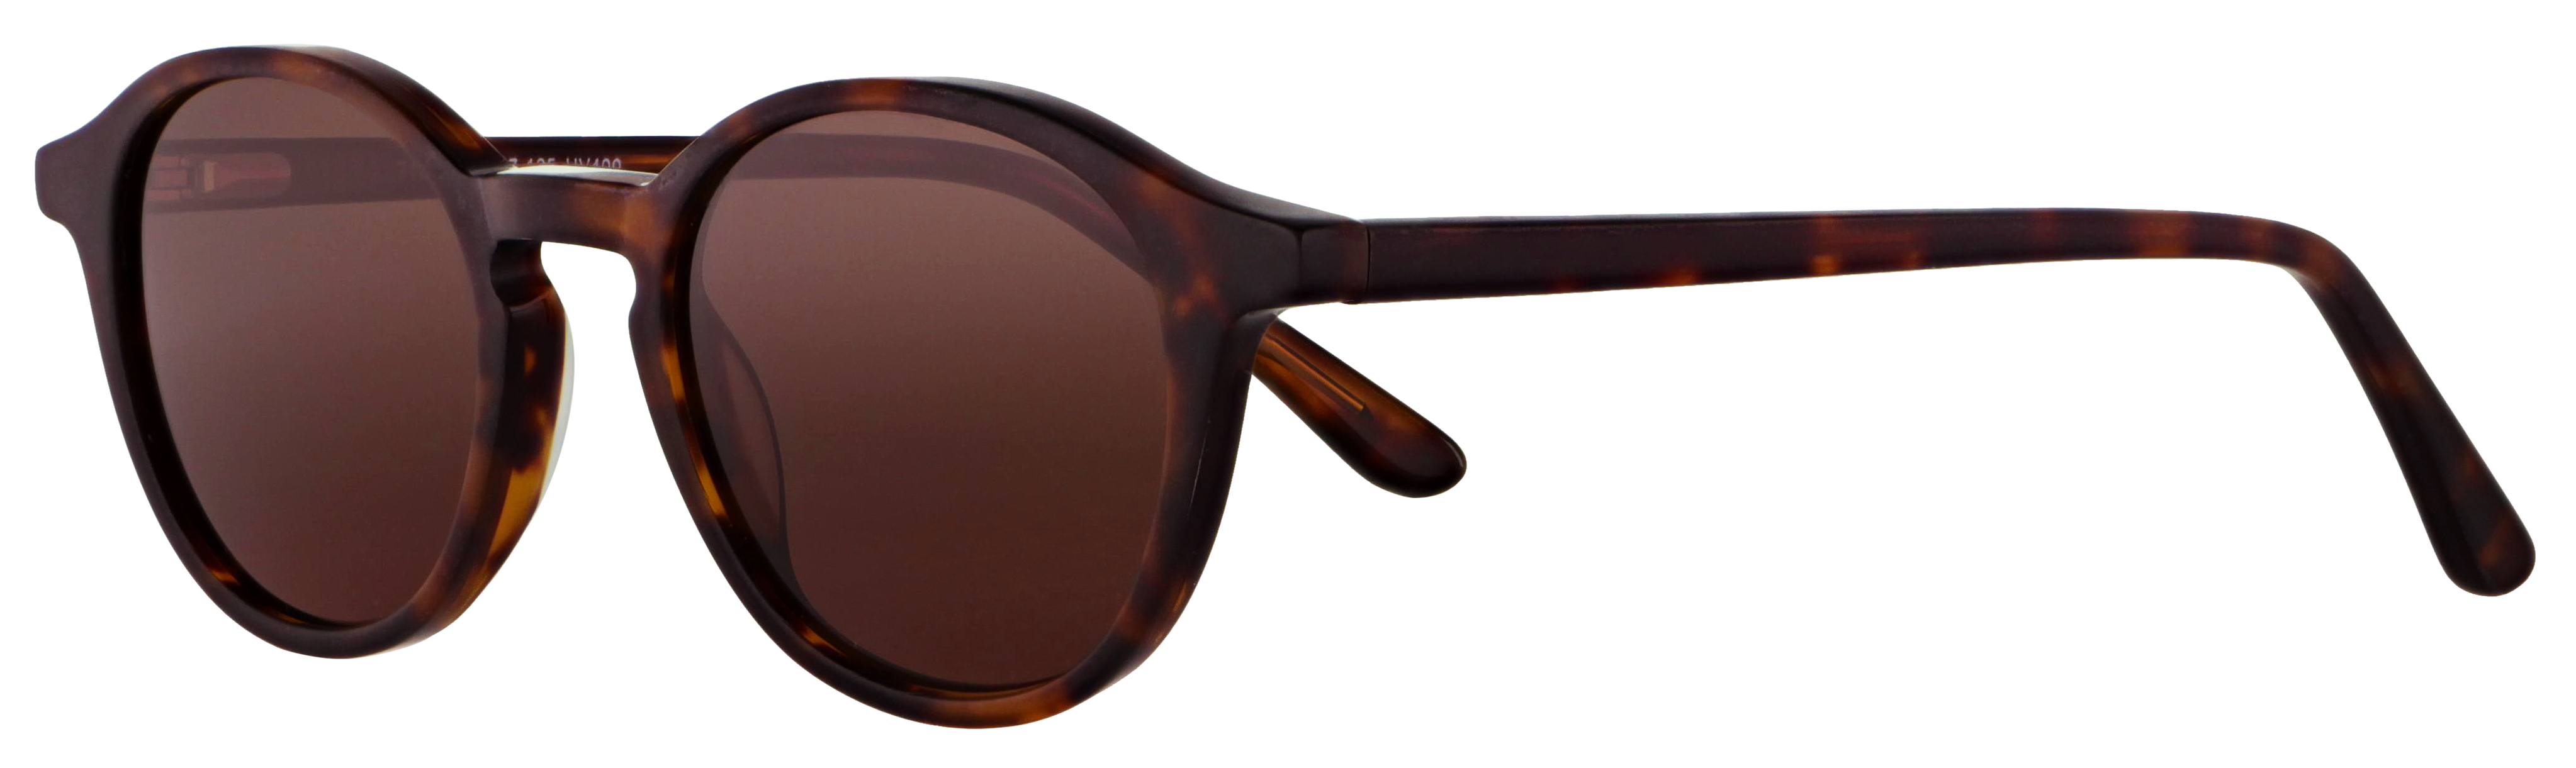 abele optik Kindersonnenbrille 718751